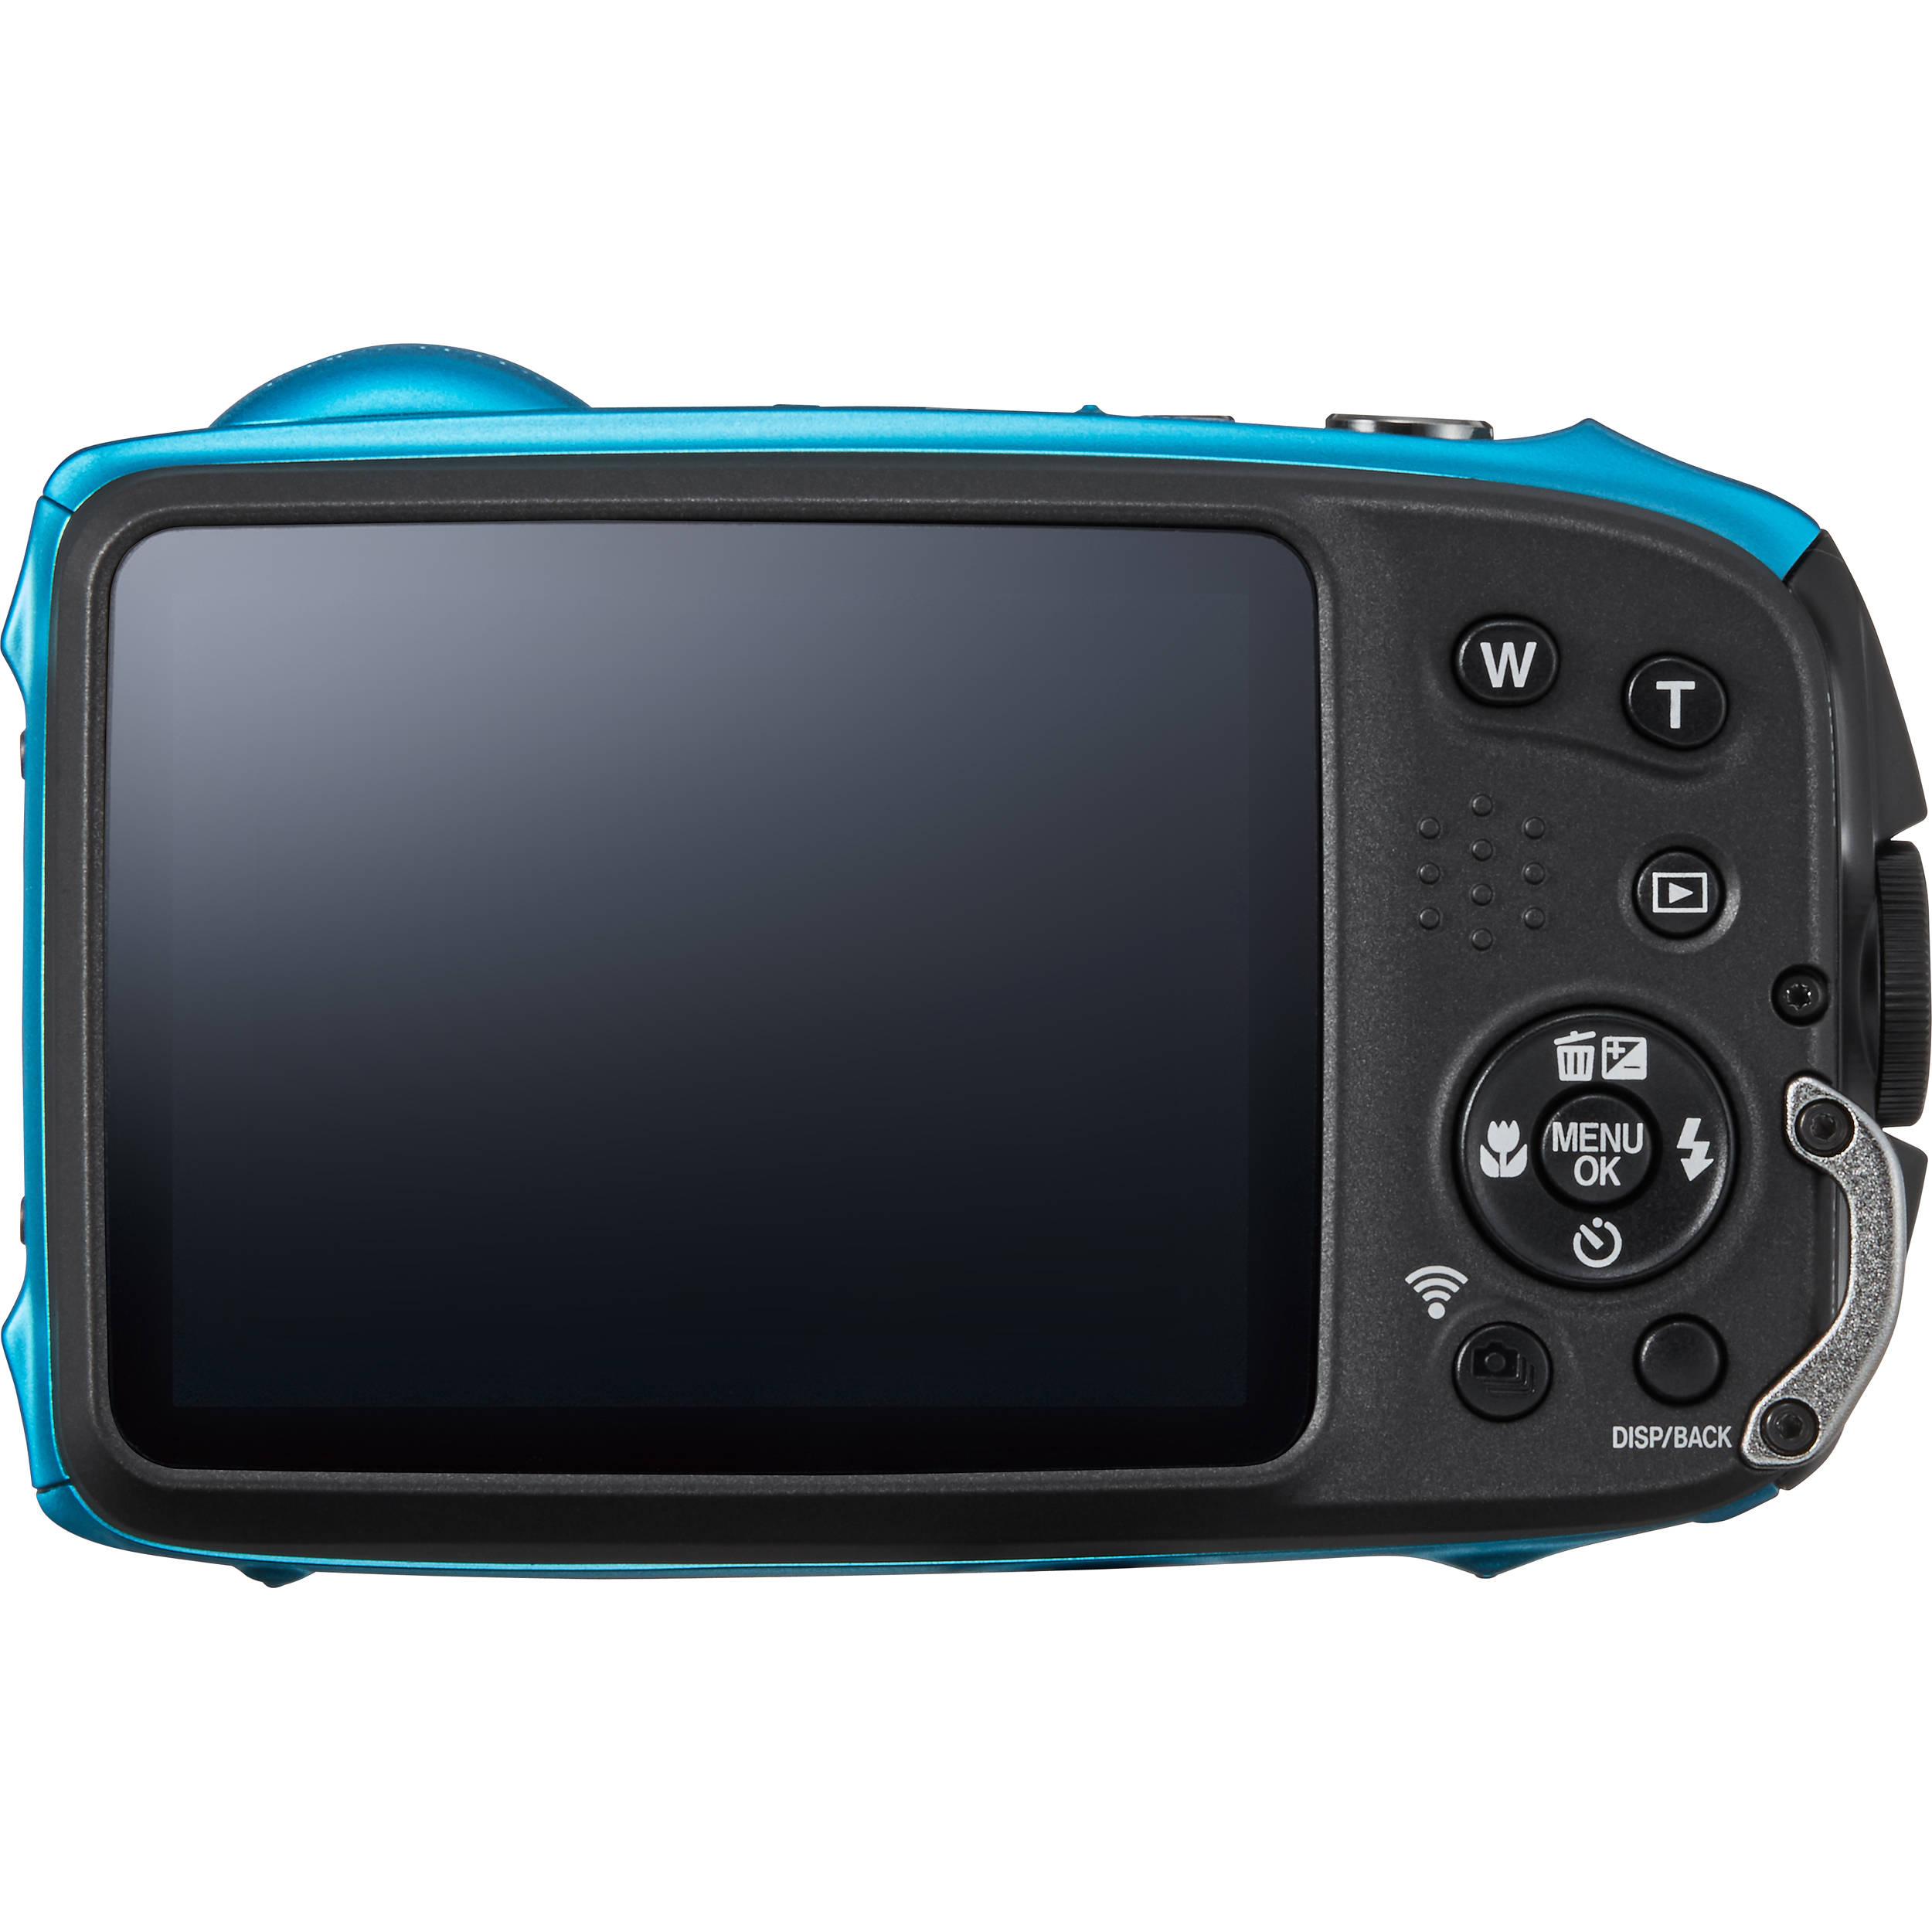 6ave Electronics: Fujifilm FinePix XP120 Digital Camera (Sky Blue) 600019758 + 16GB SDHC Class